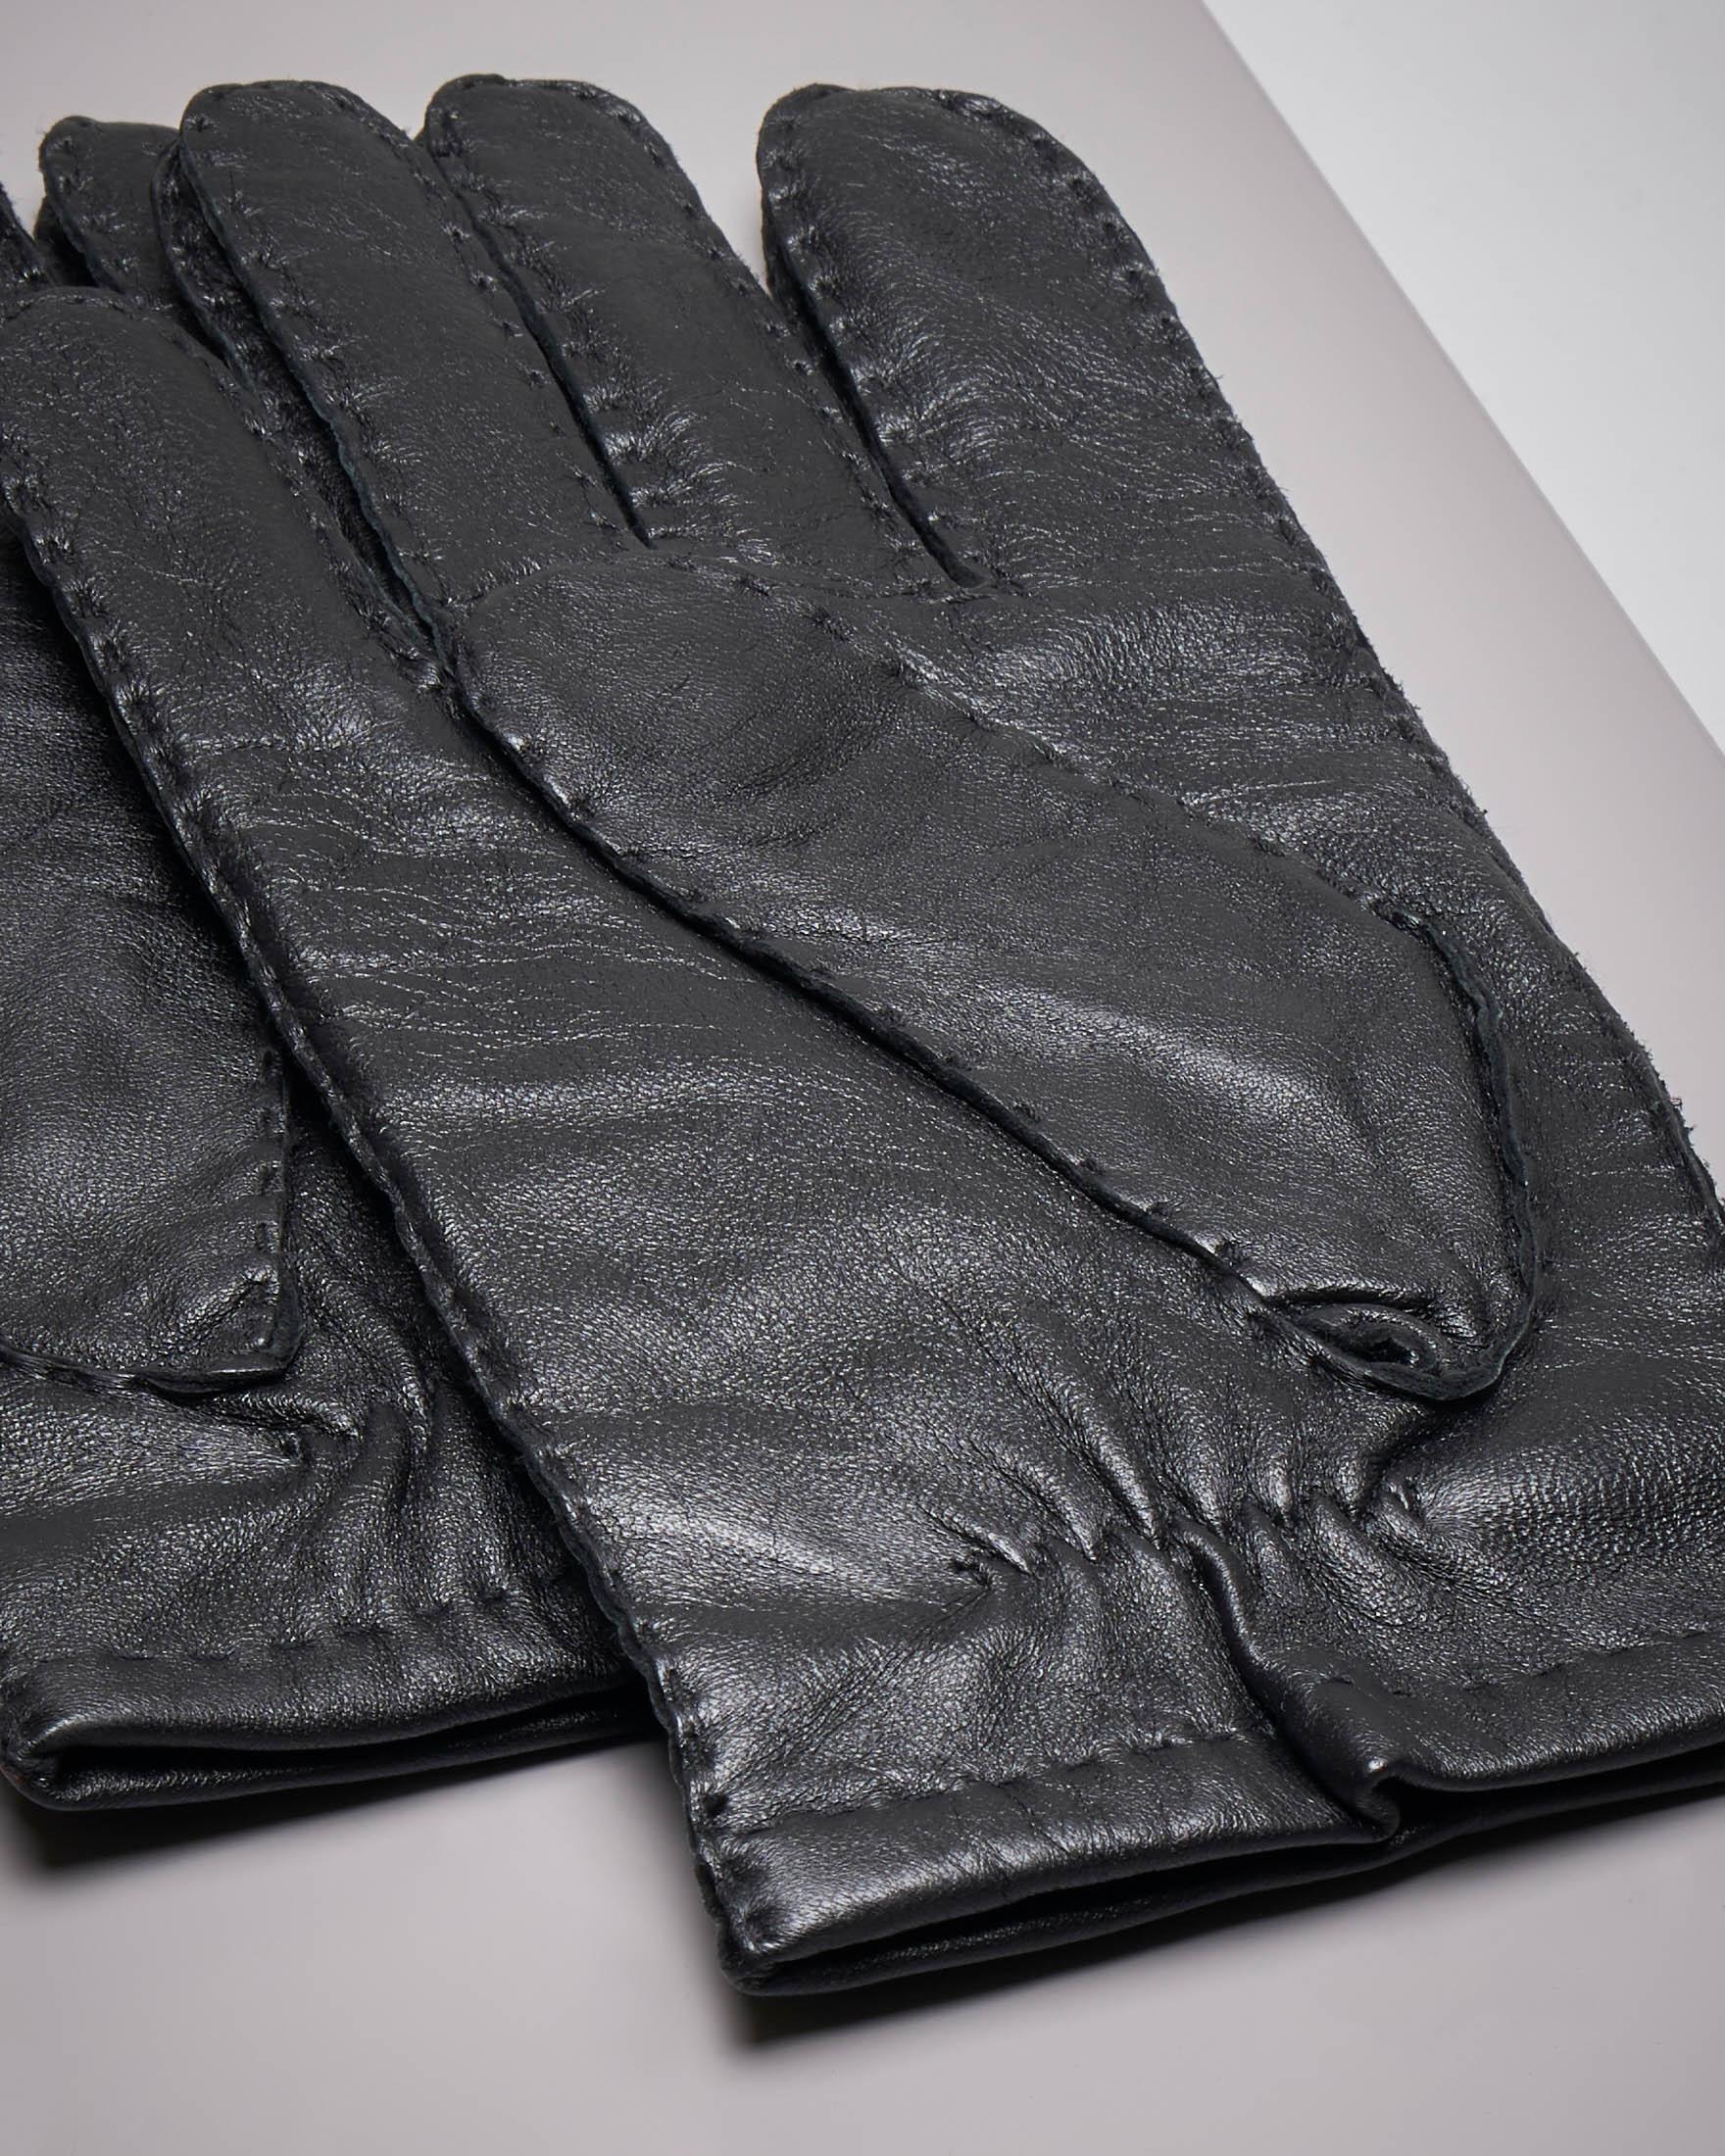 Guanti neri in pelle martellata con impunture